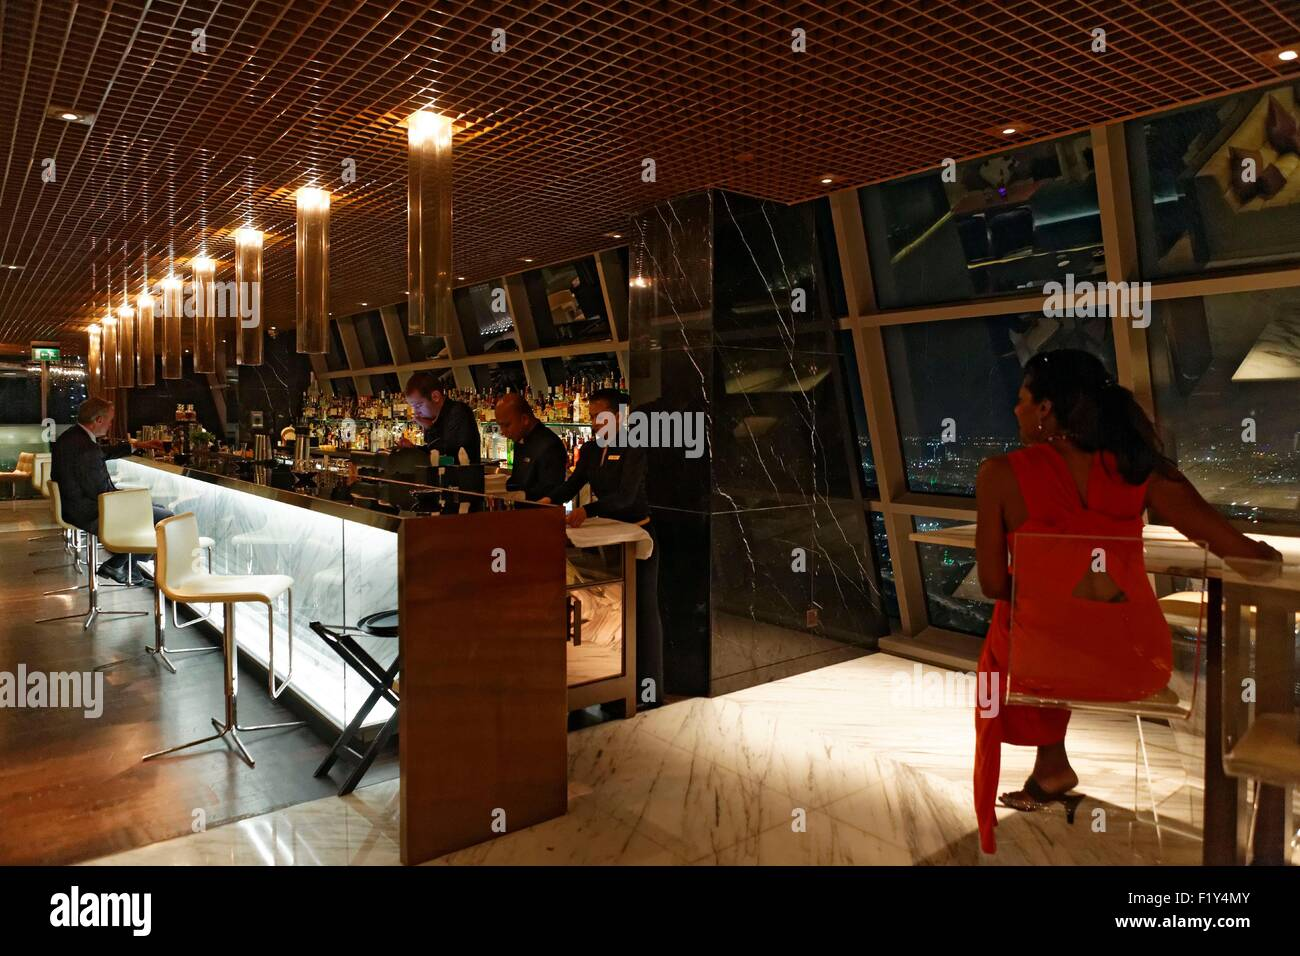 United Arab Emirates, Abu Dhabi, Etihad Towers, Jumeirah Hotel, Ray's Bar located at the 62th floor - Stock Image